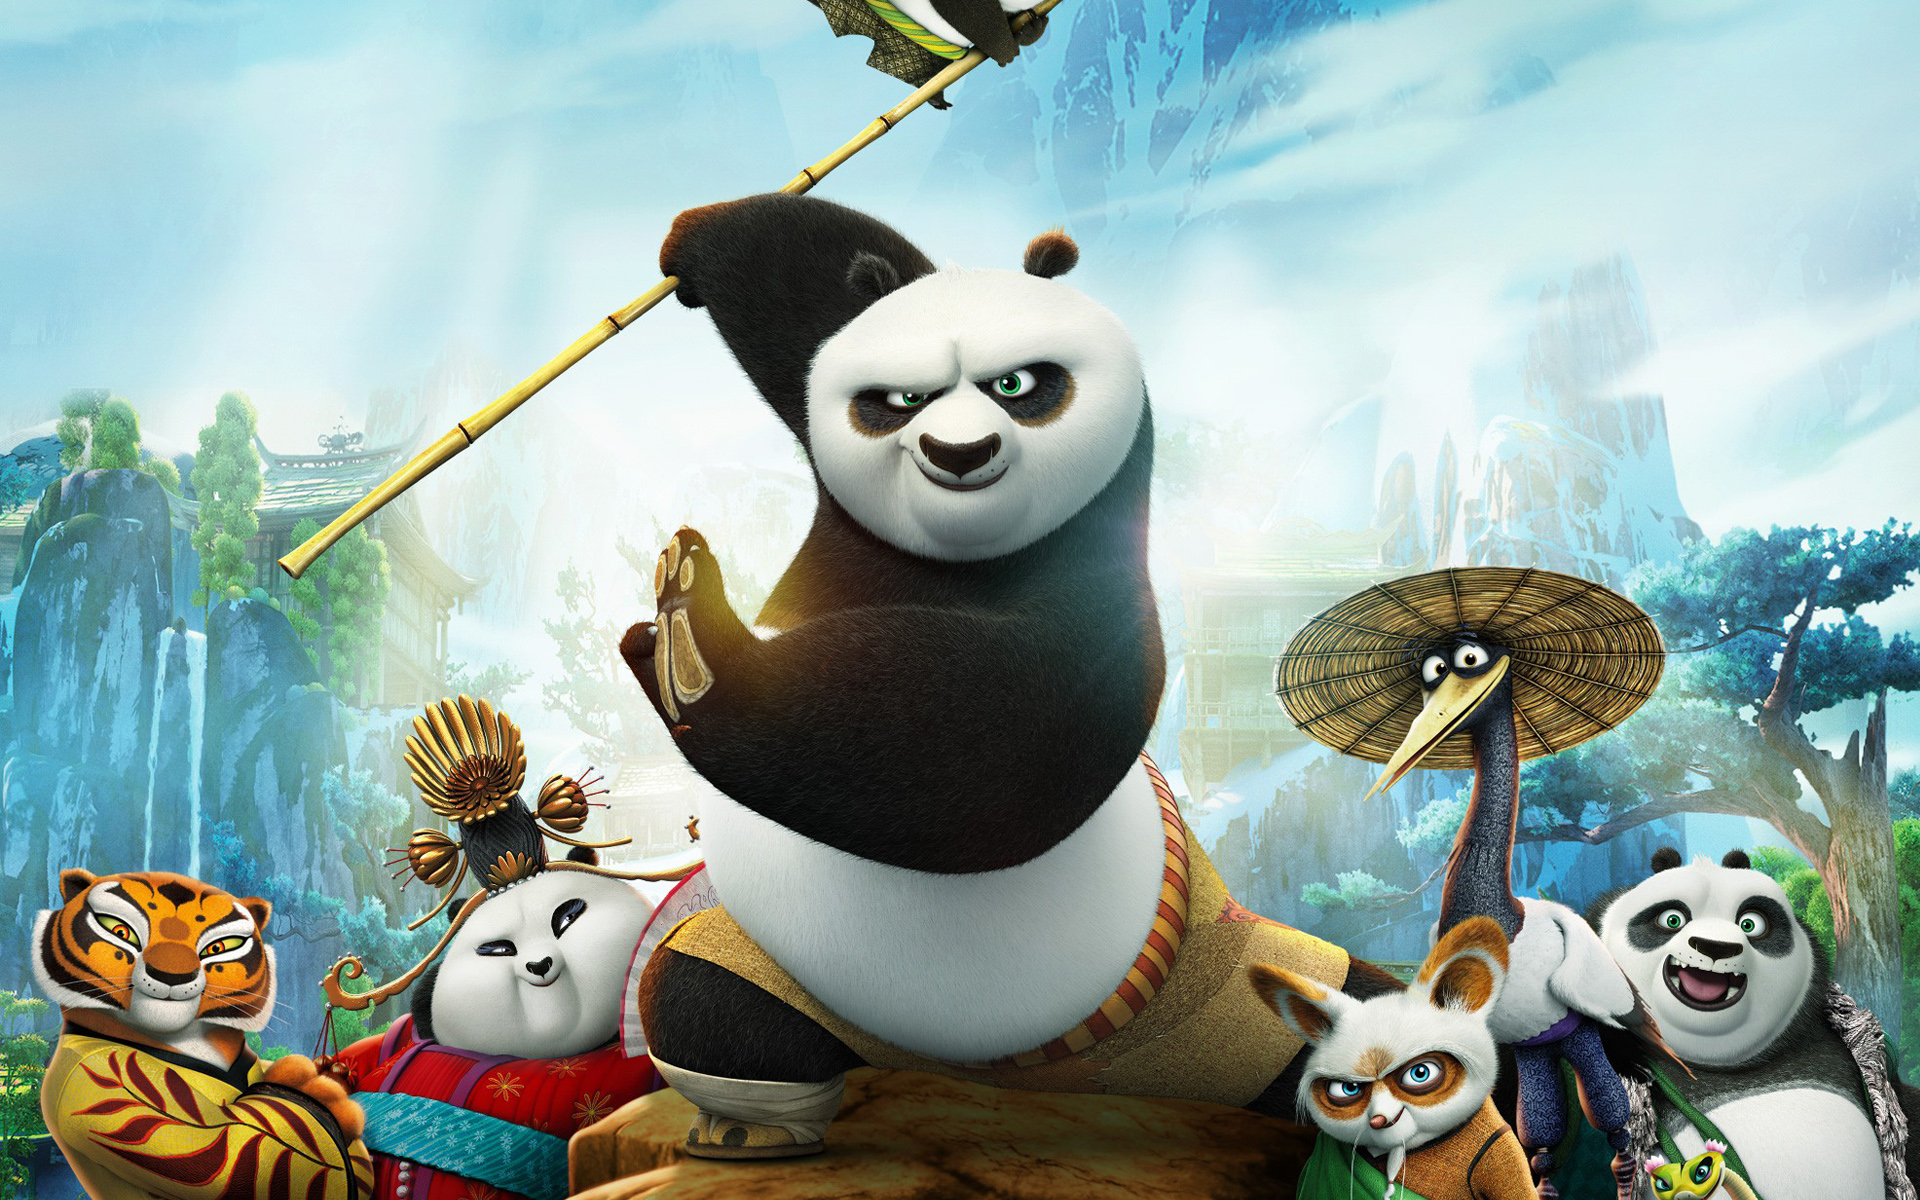 kung-fu panda 3 torrent